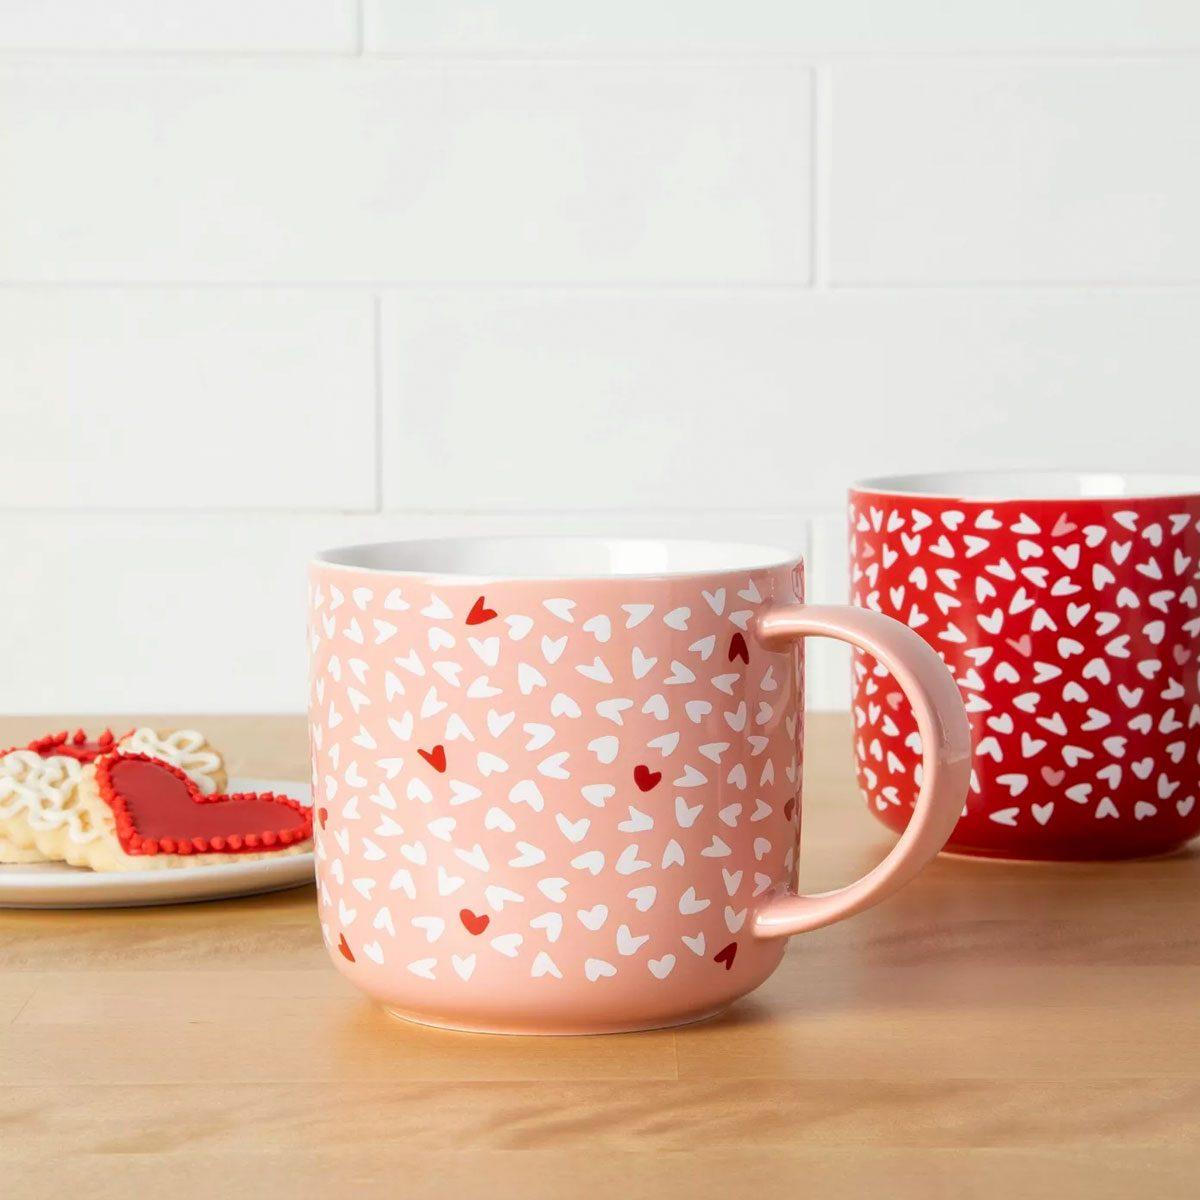 Valentine's Day gifts Matching Heart Mugs